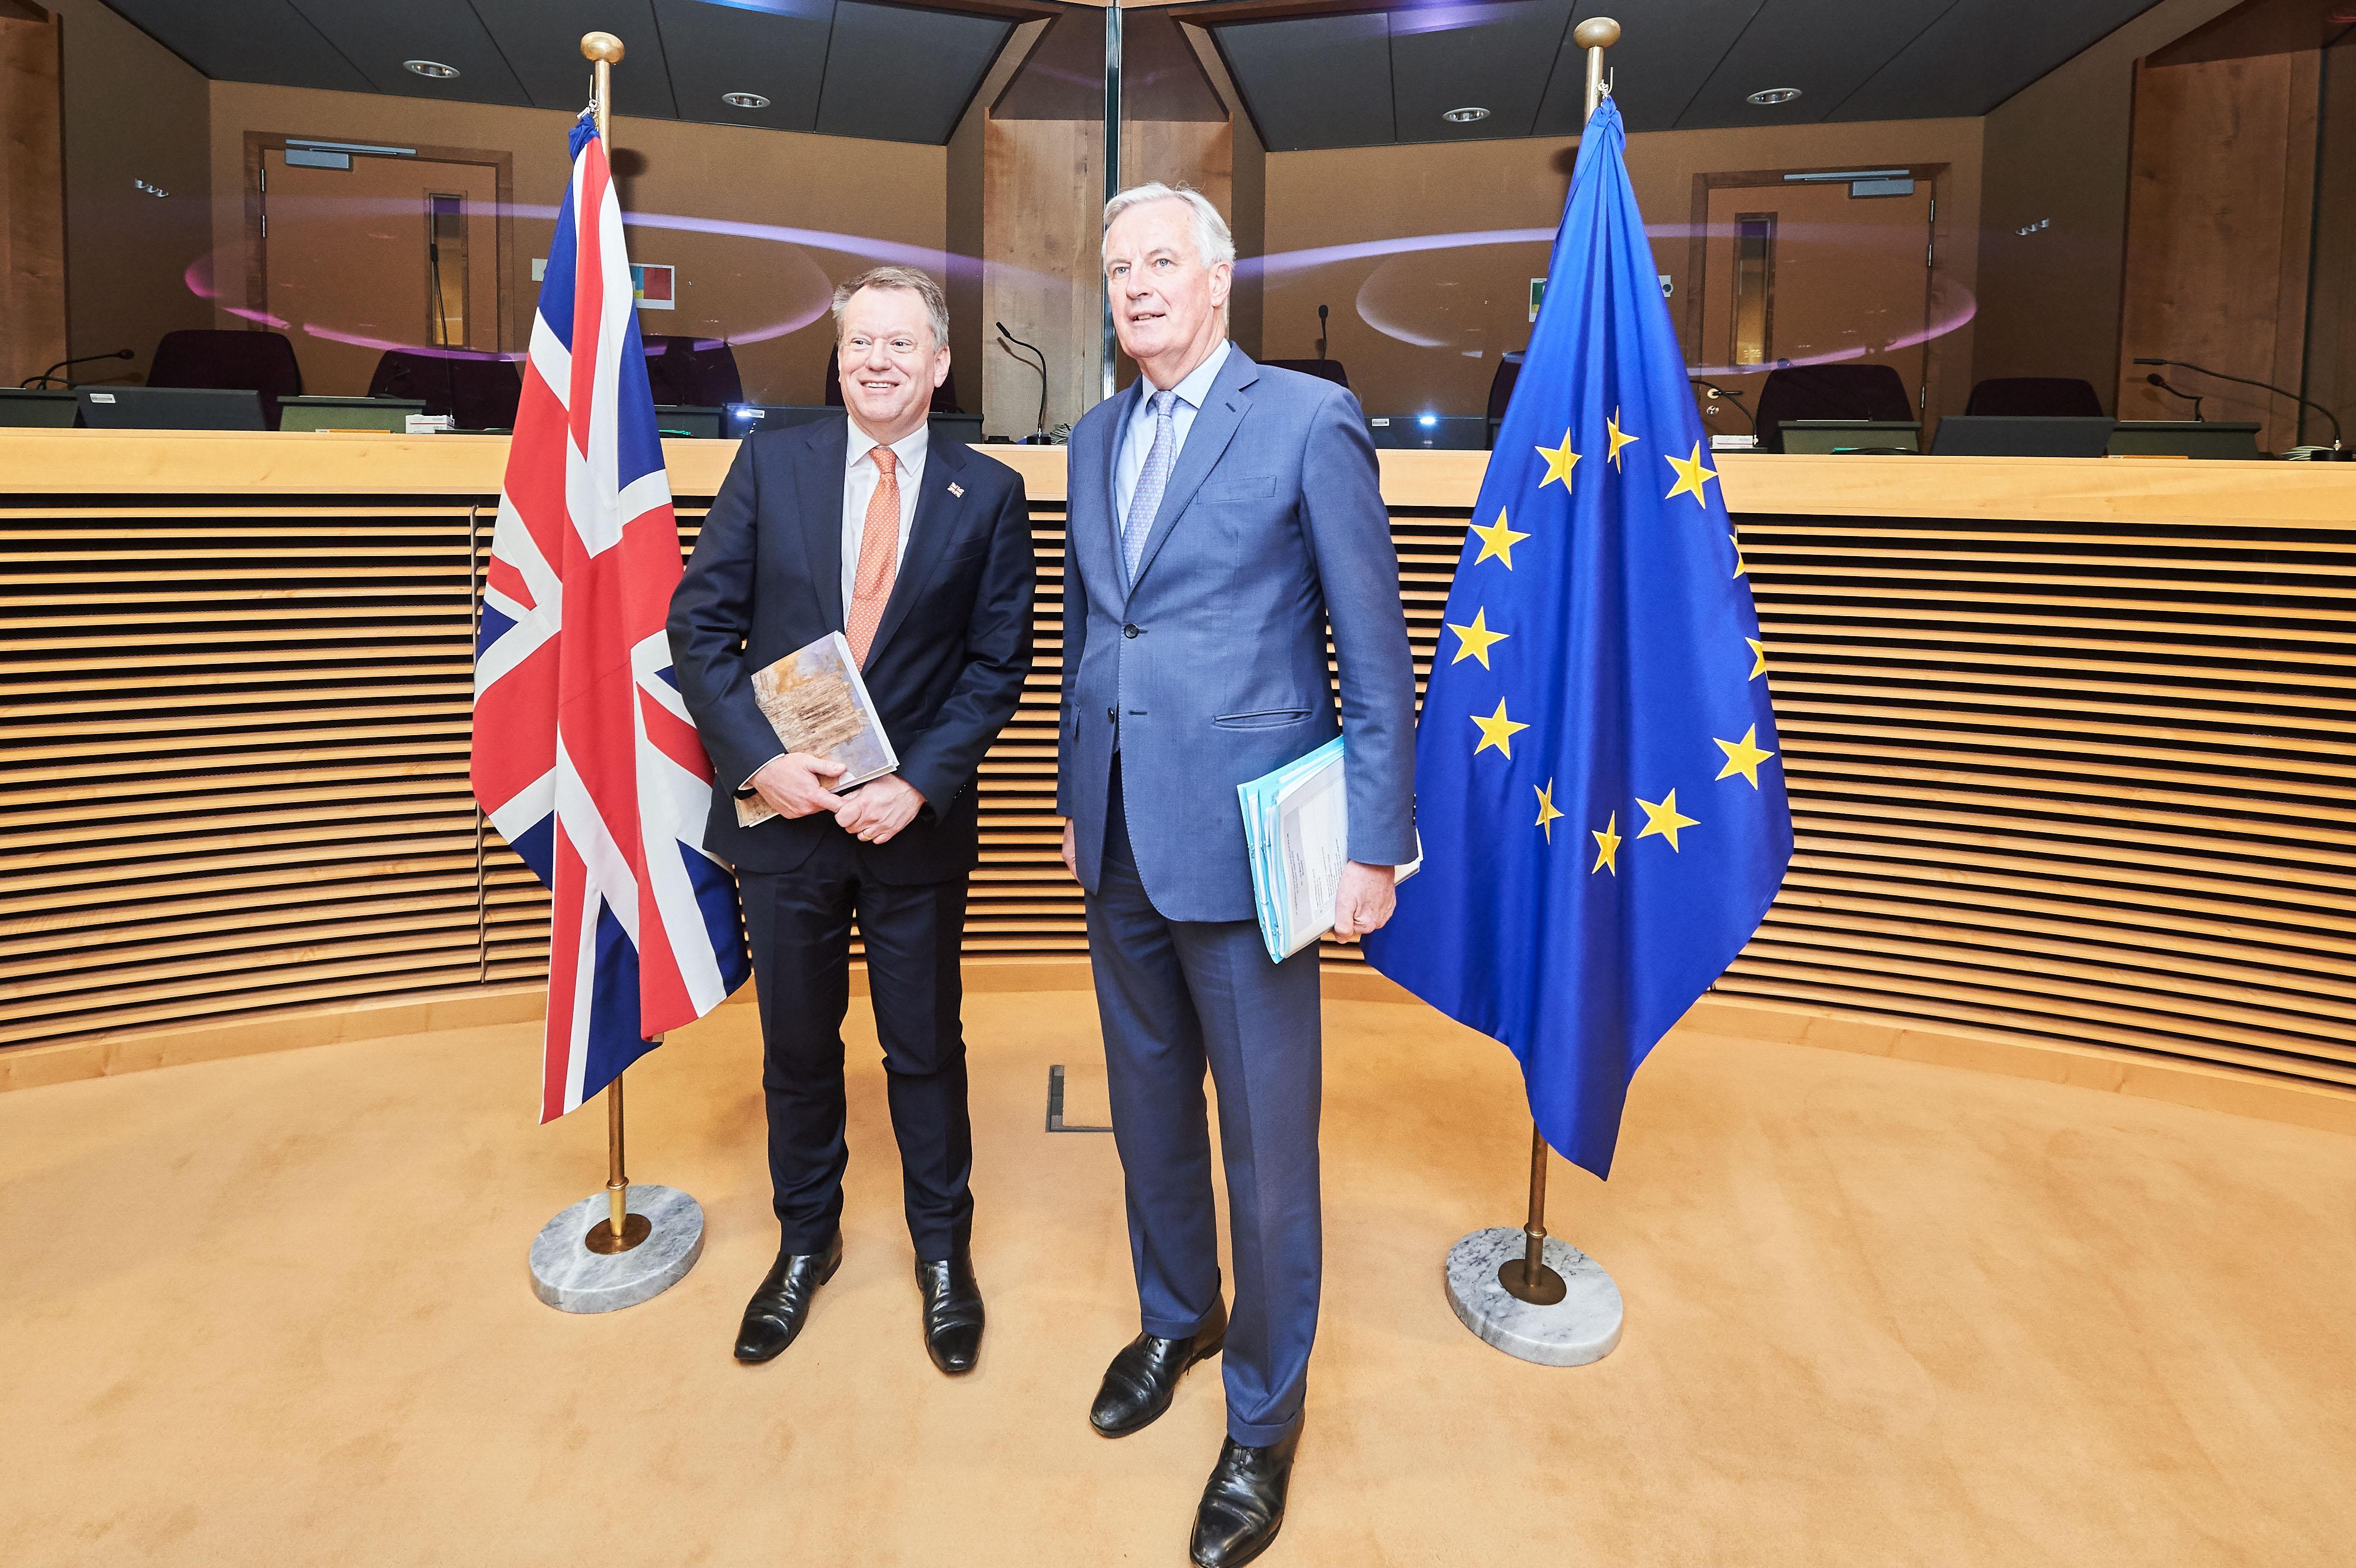 EU's Barnier warns of big divergences with United Kingdom in talks